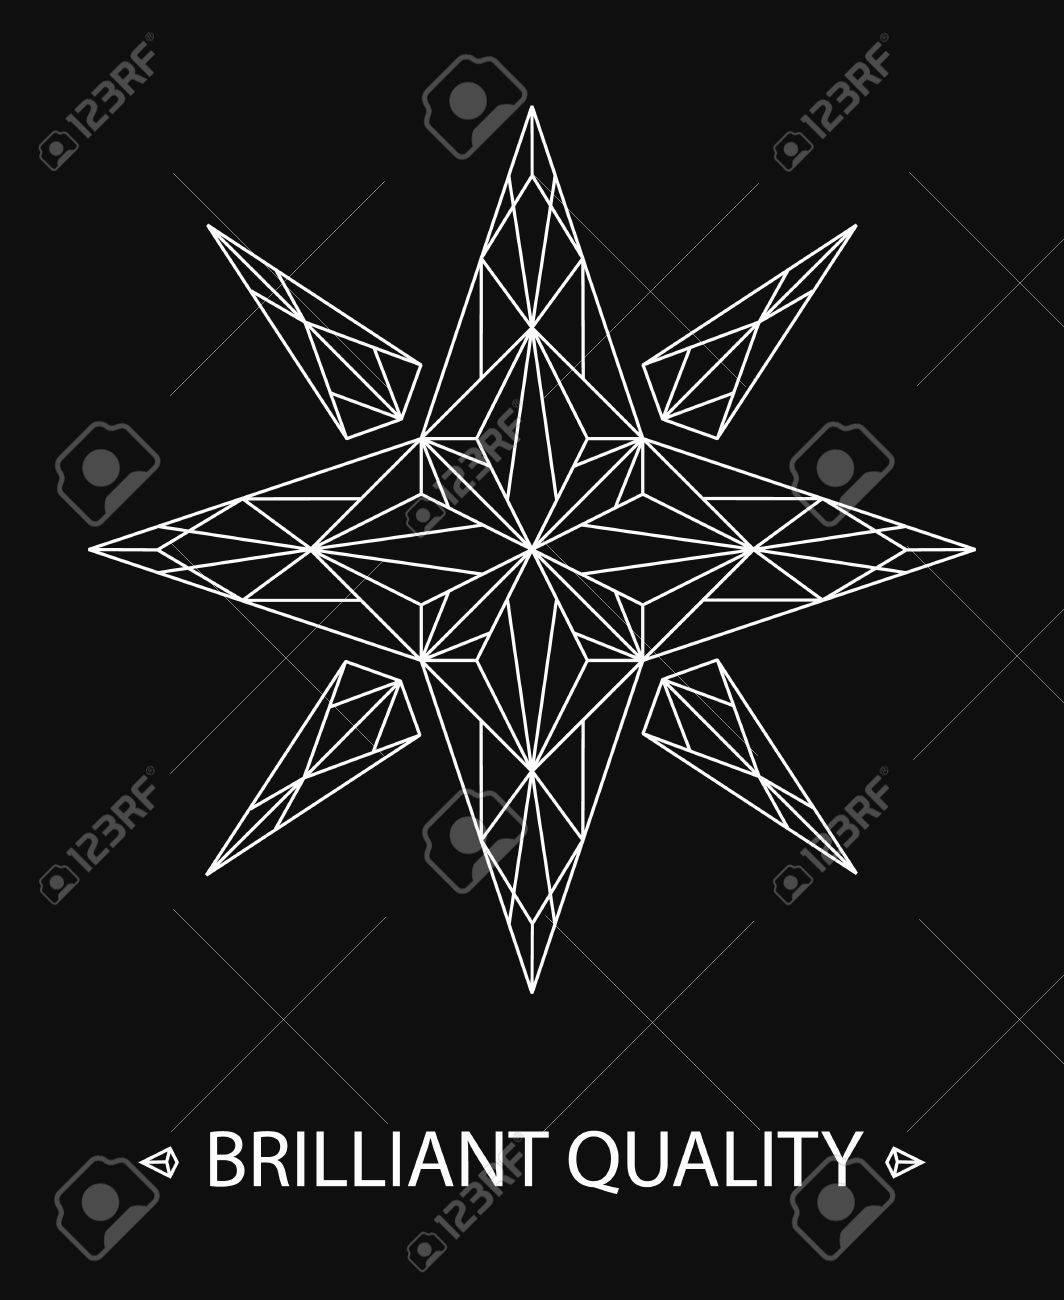 Brilliant star logo on black background elegant line design brilliant star logo on black background elegant line design for corporate identity business card magicingreecefo Gallery